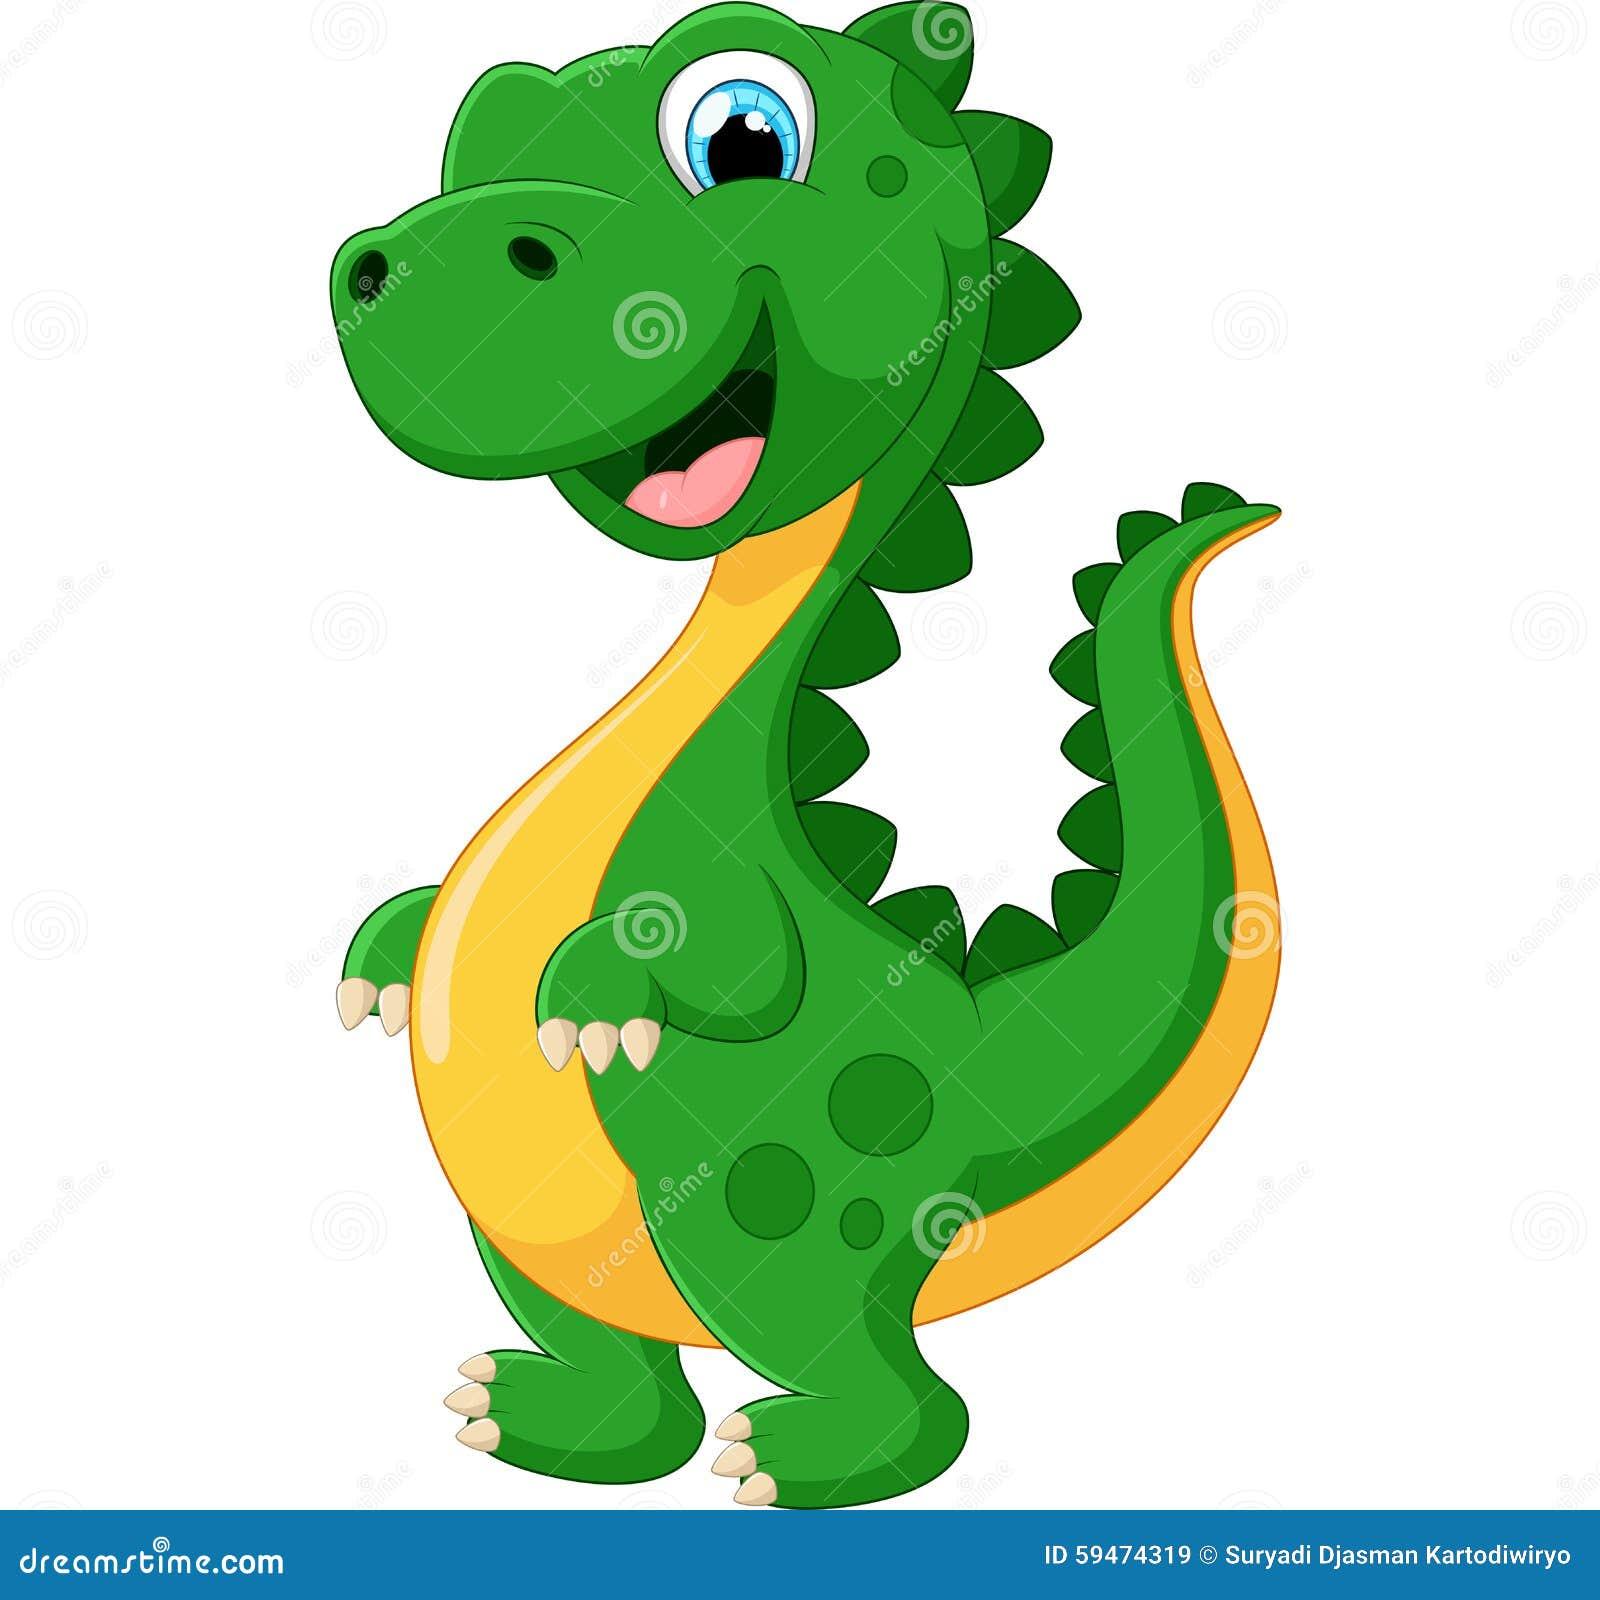 Cartoon Happy Dinosaur Stock Vector Image: 59474319 - 1300x1317 - jpeg